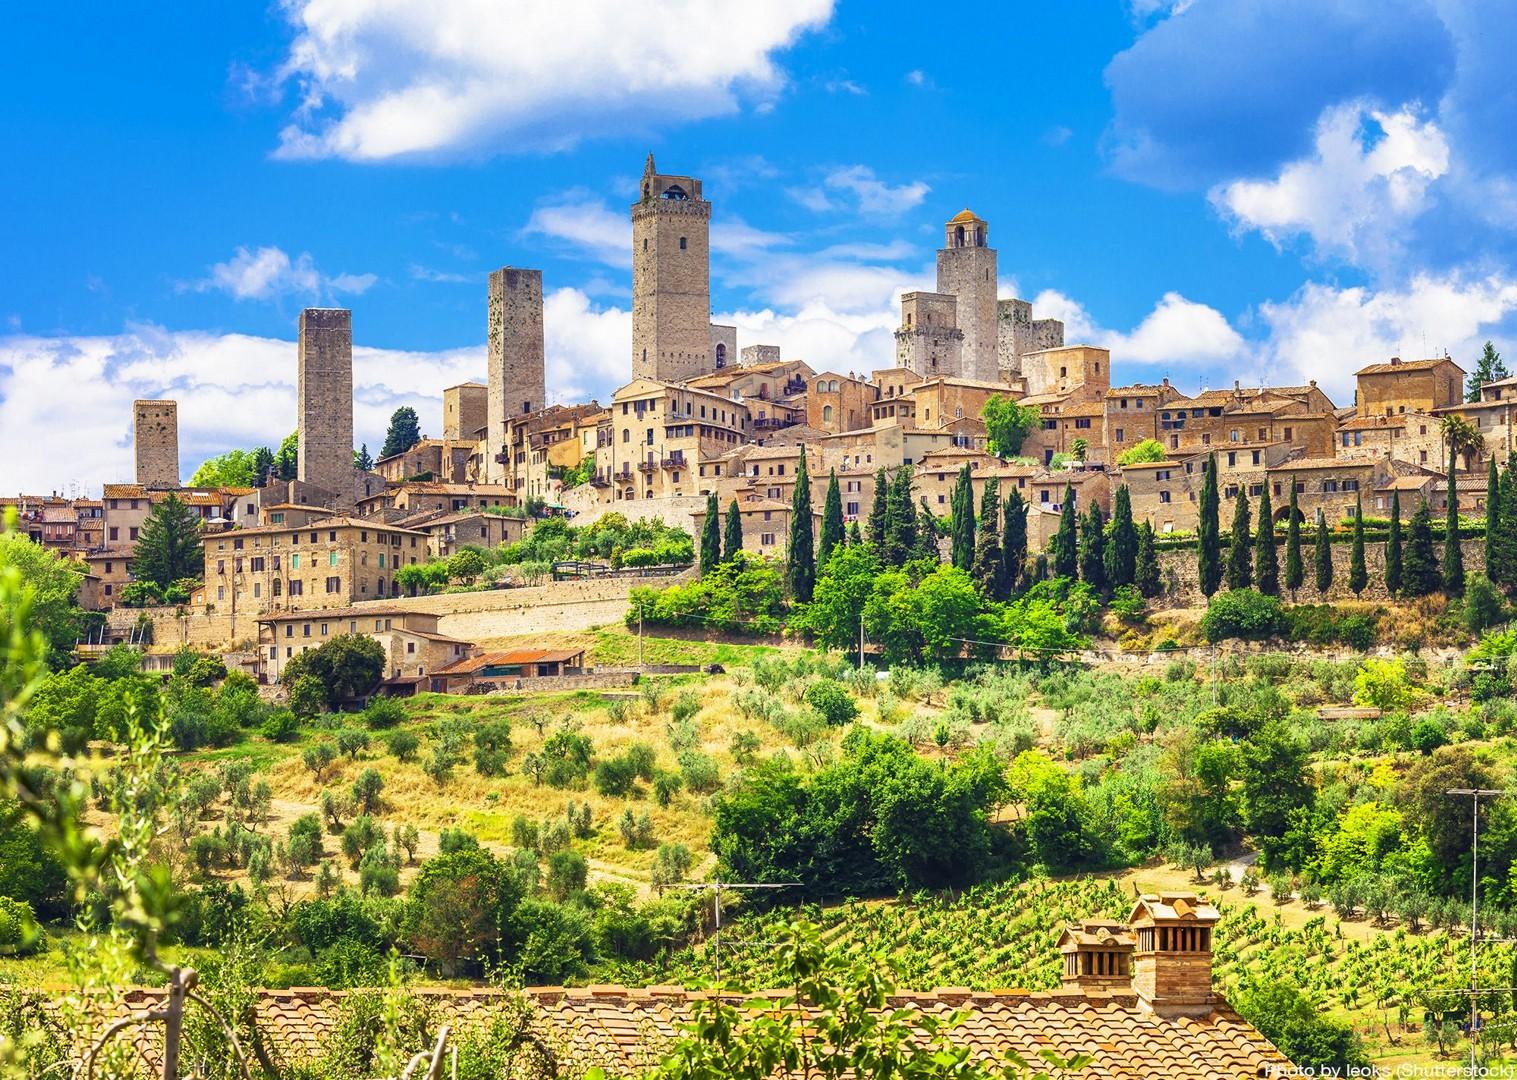 san-giminiano-italy-tuscany-leisure-cycling-culture.jpg - Italy - Tuscany - Giro della Toscana - Guided Road Cycling Holiday - Road Cycling